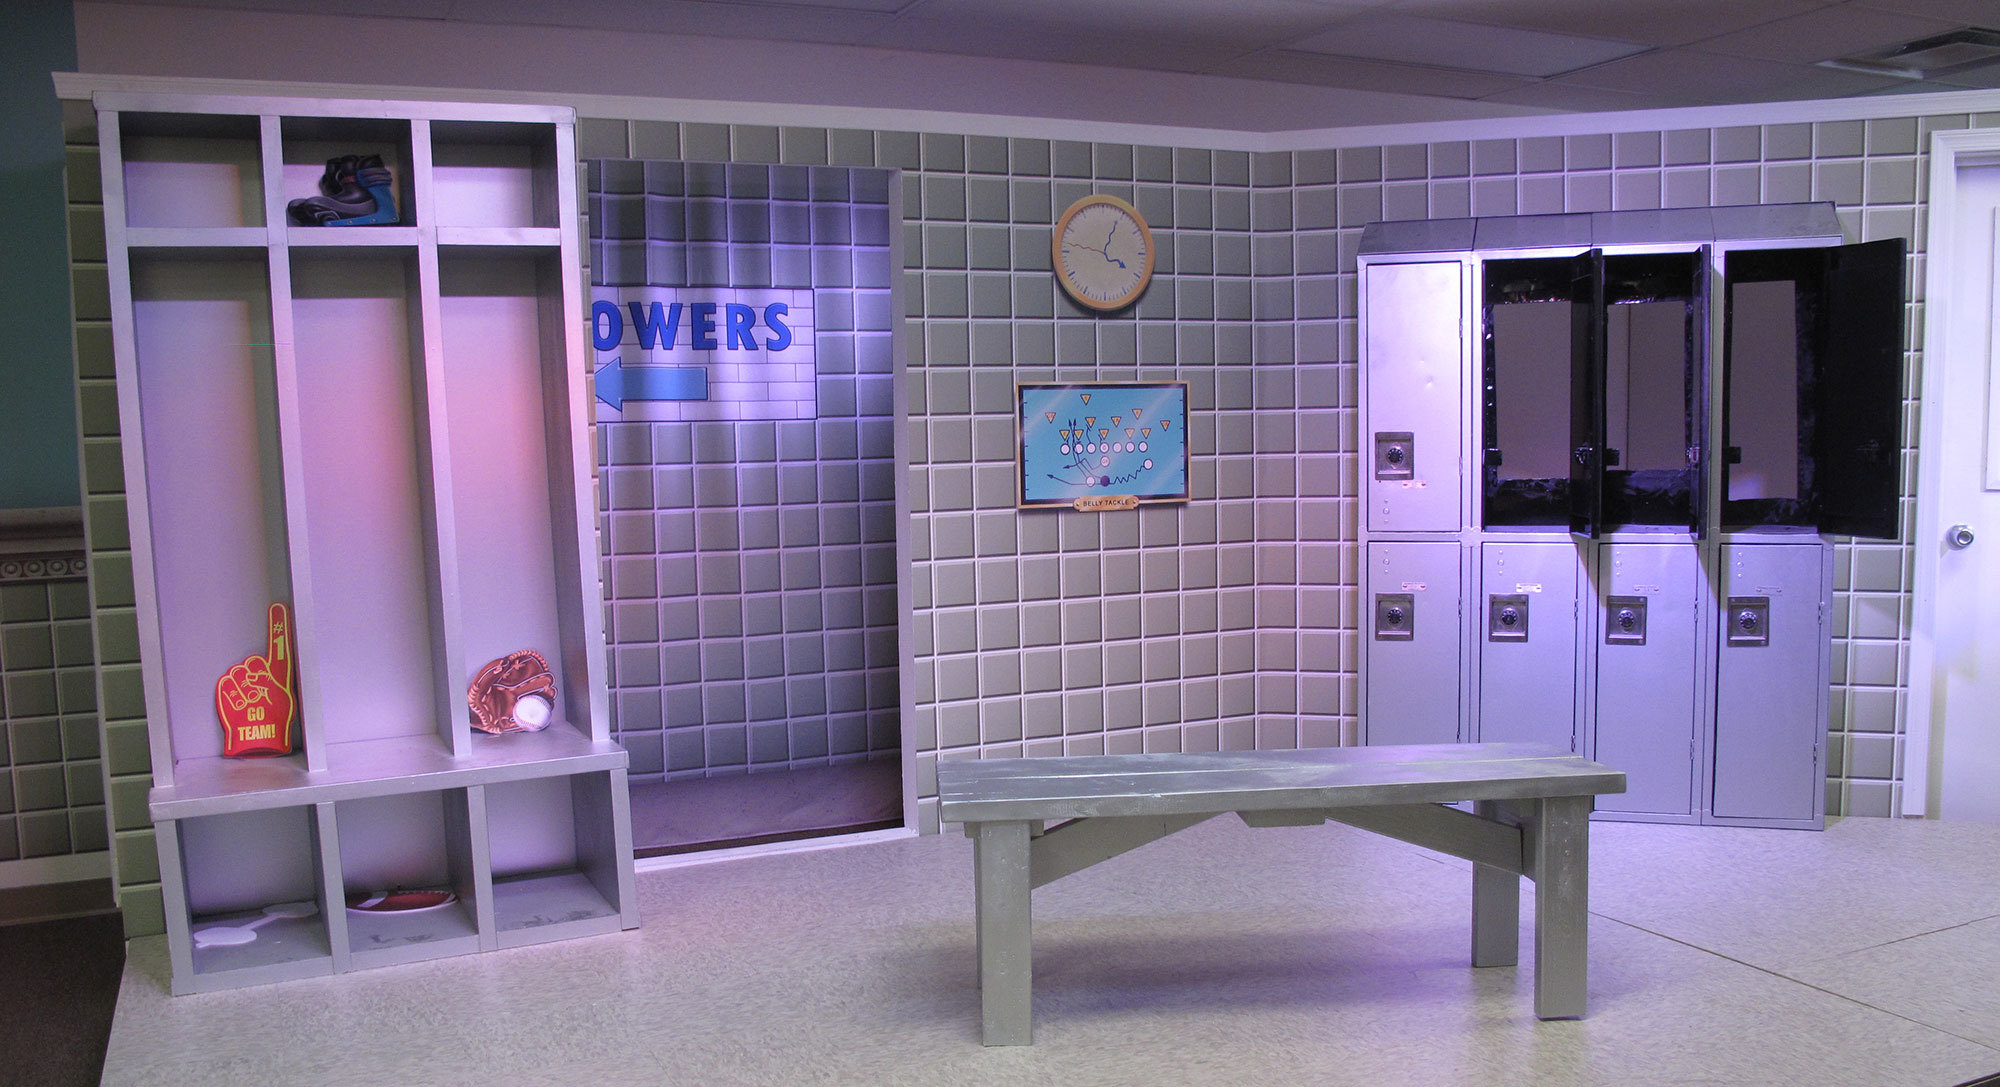 Sports Locker Room Themed Environment at Casas Church